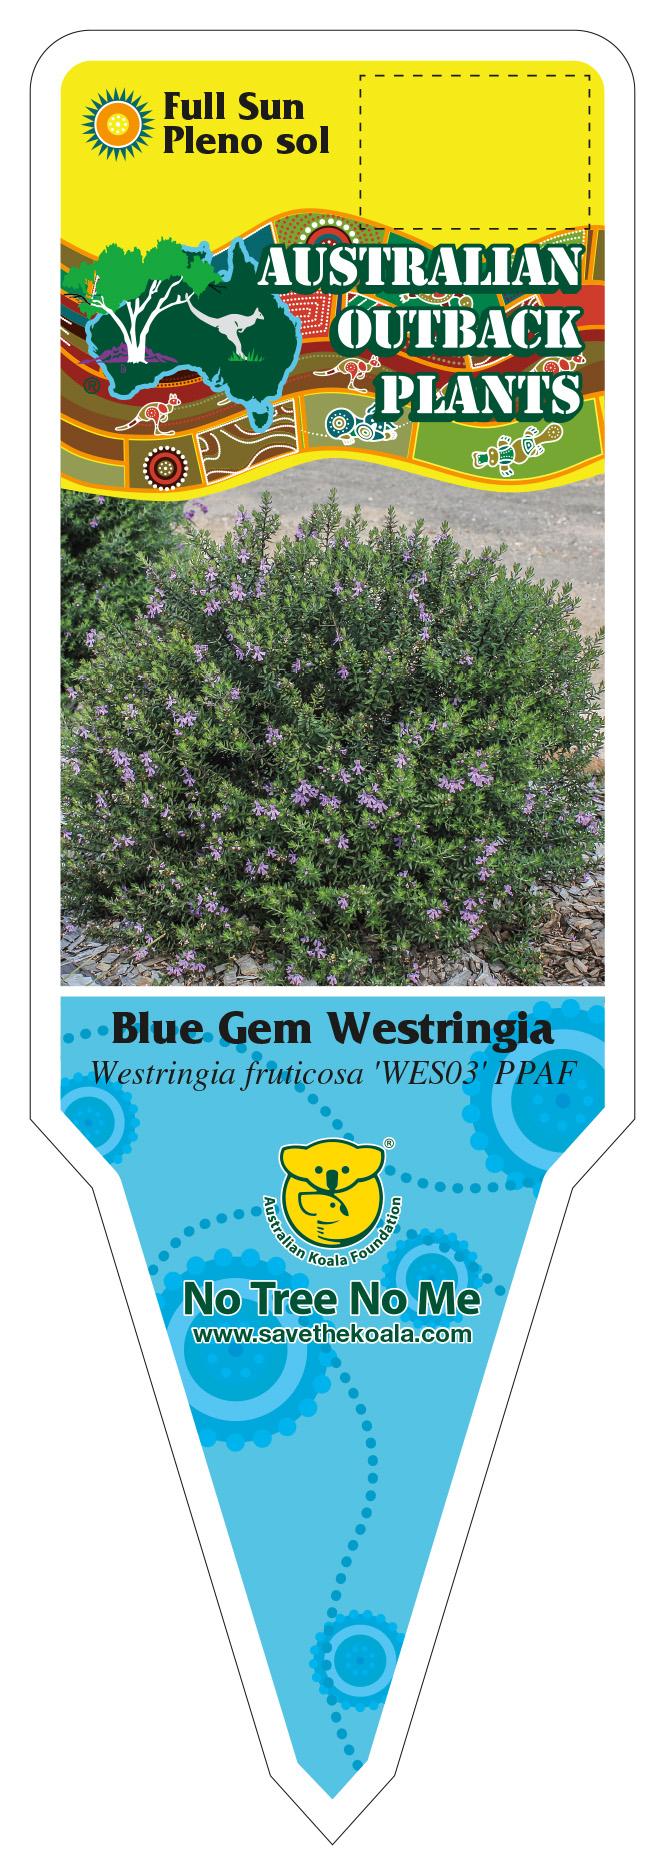 432442_FRONT-Blue-Gem-Westringa.jpg